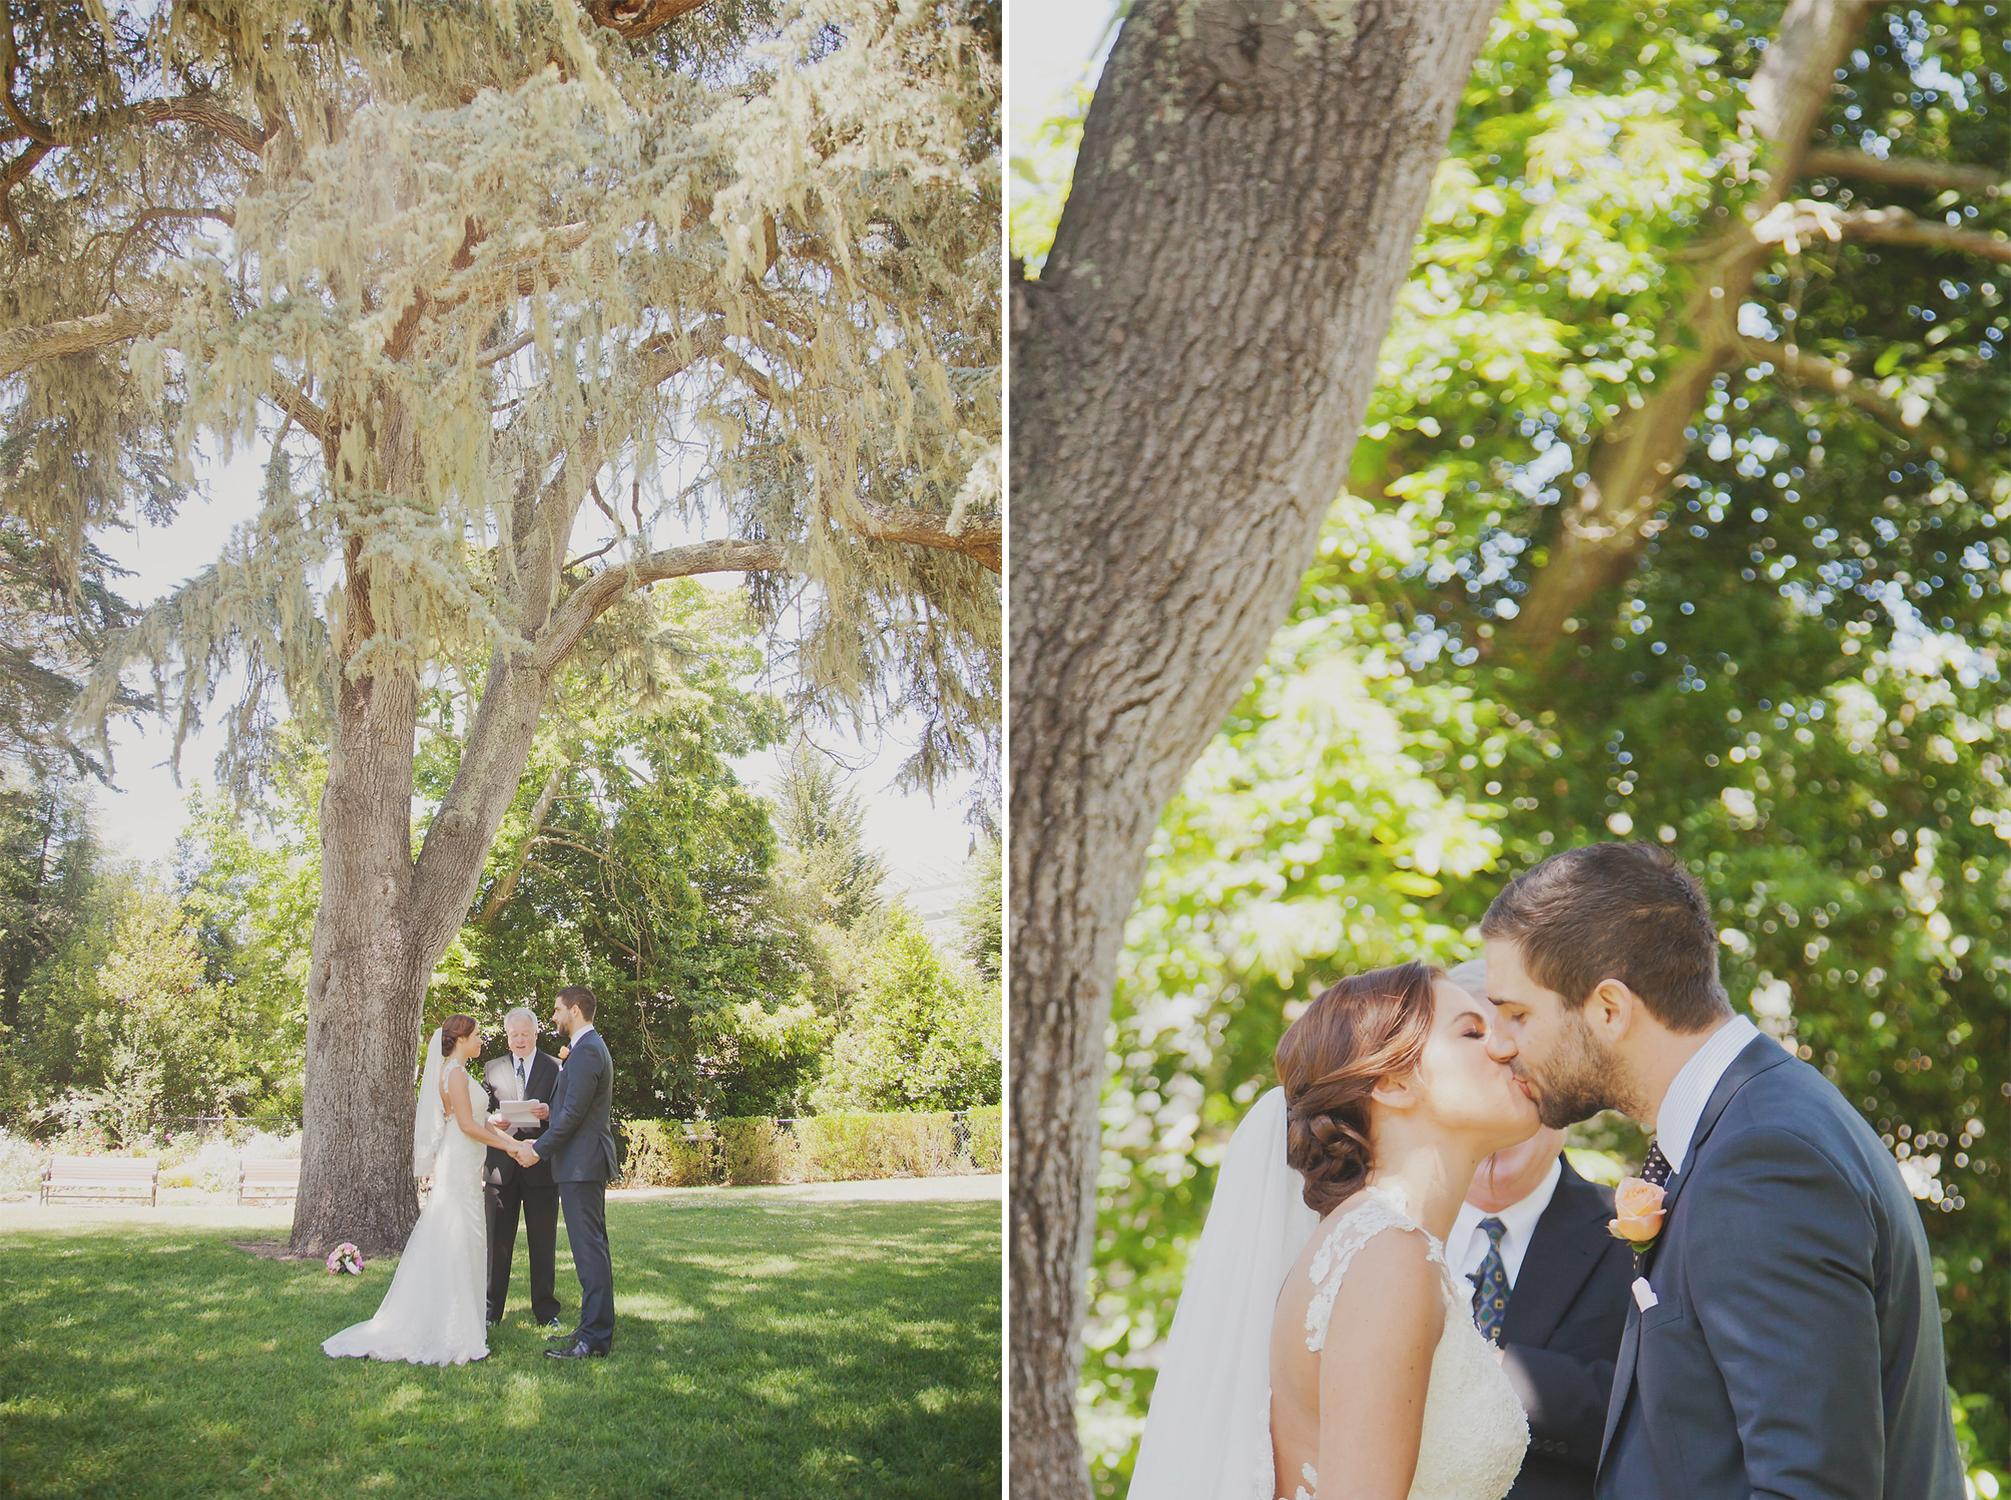 wellington wedding photography NZ - 0232.JPG